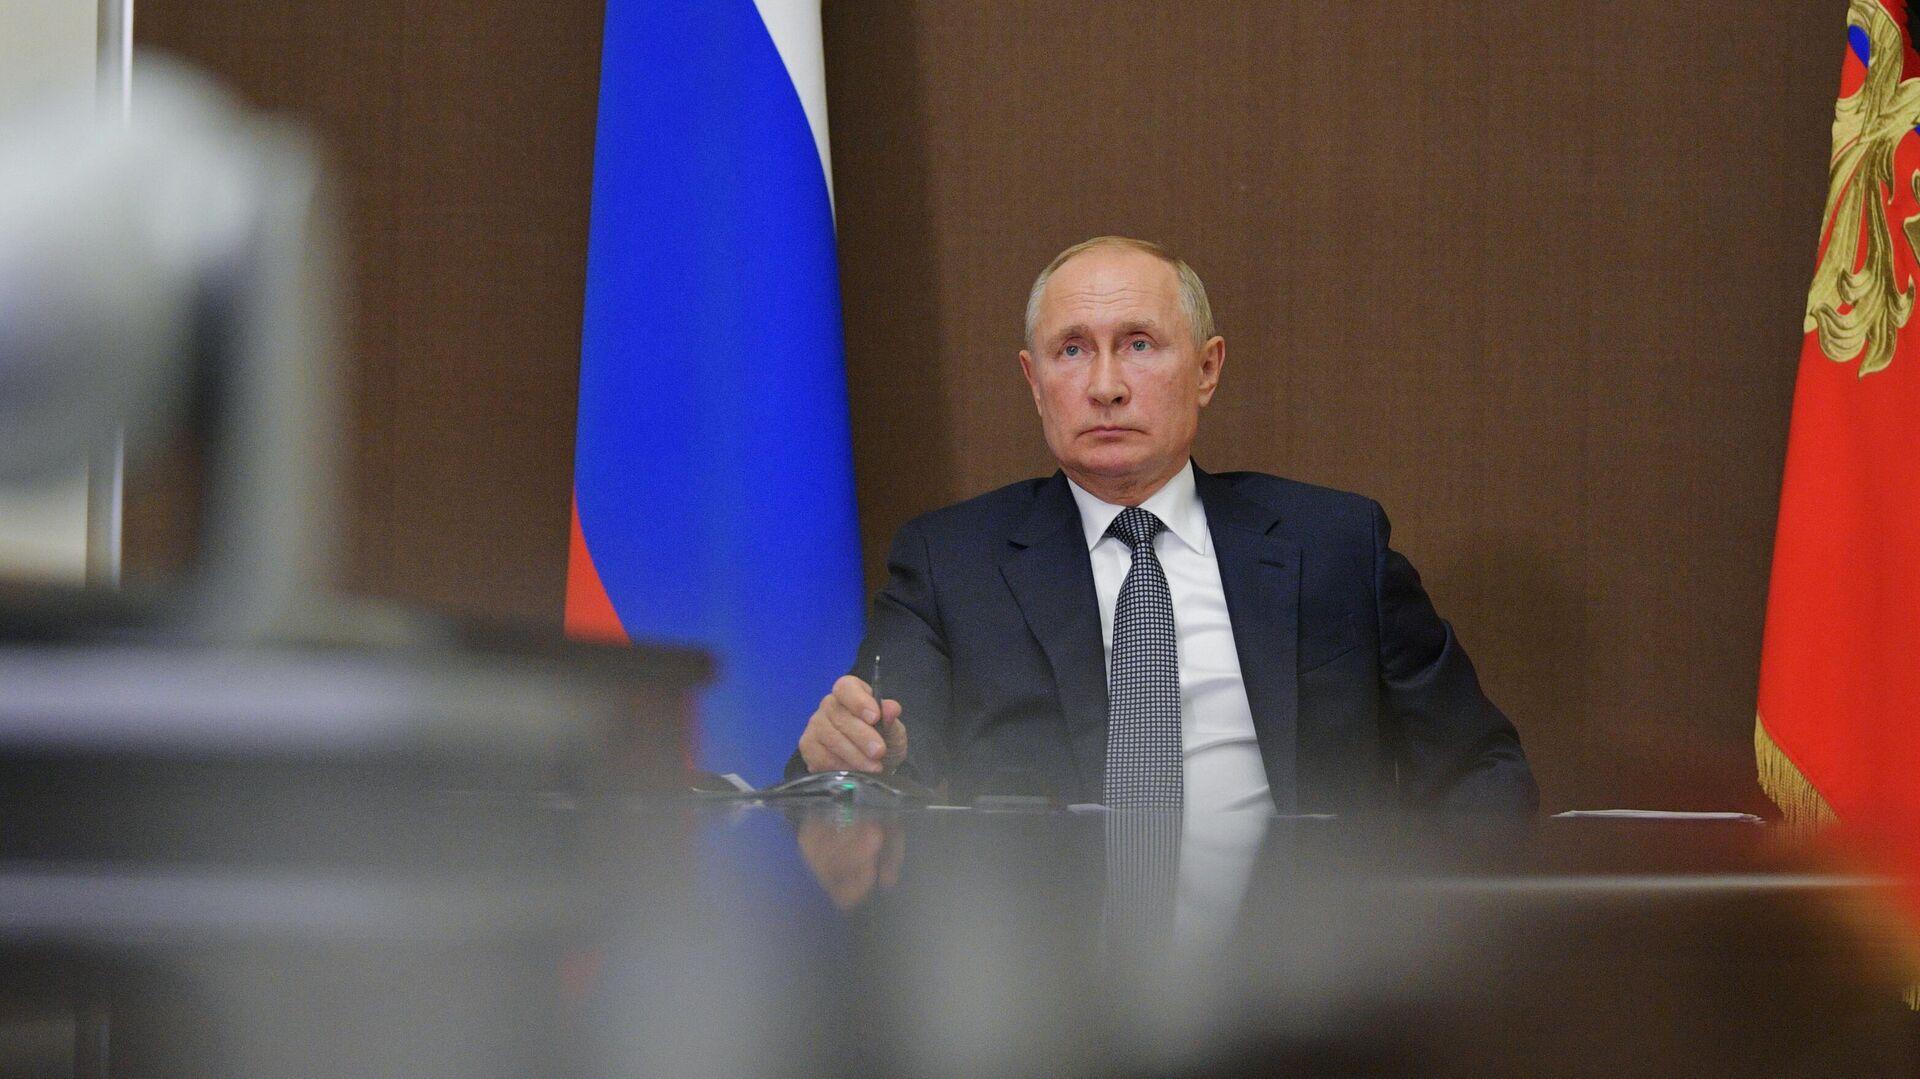 Президент РФ Владимир Путин проводит заседание Госсовета - РИА Новости, 1920, 28.09.2020